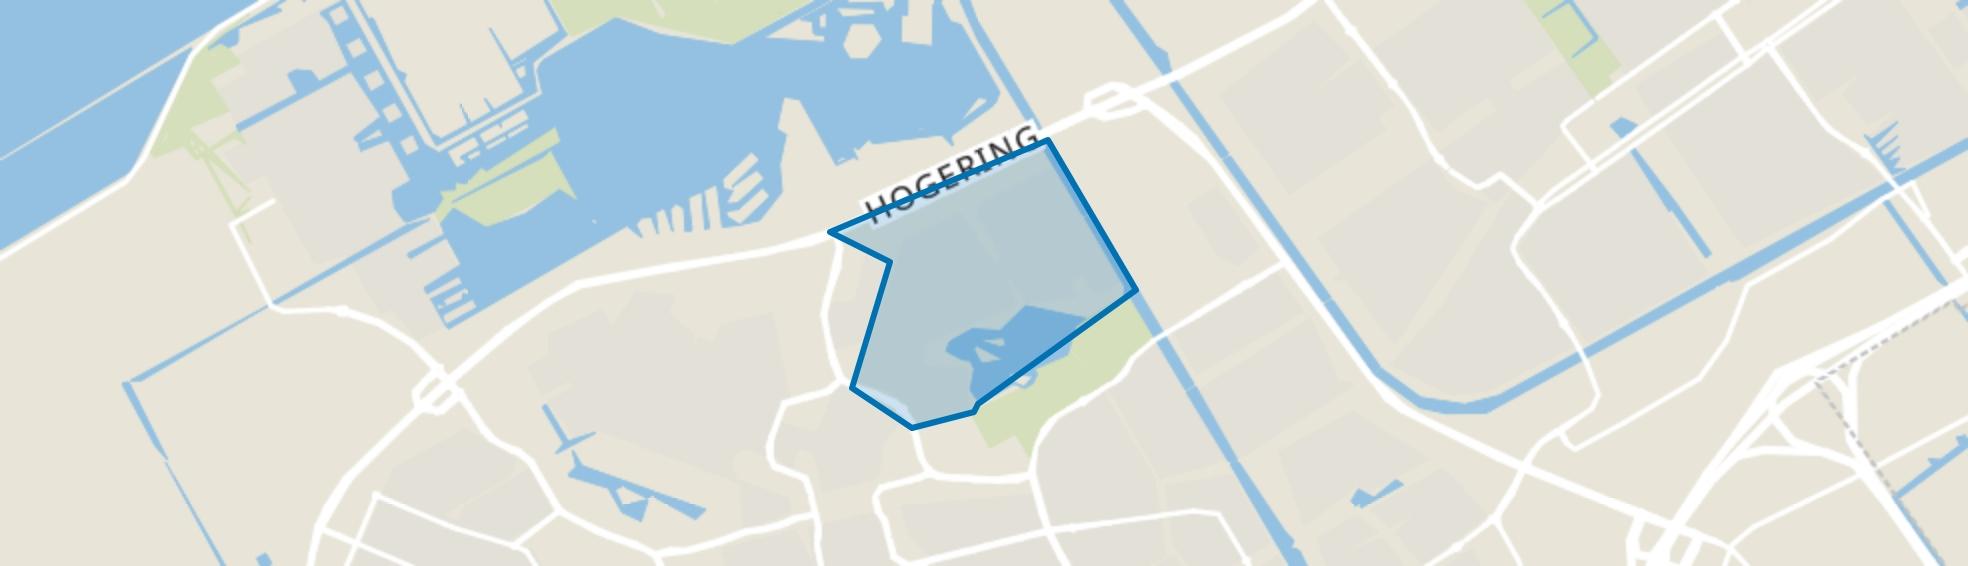 Waterwijk, Almere map